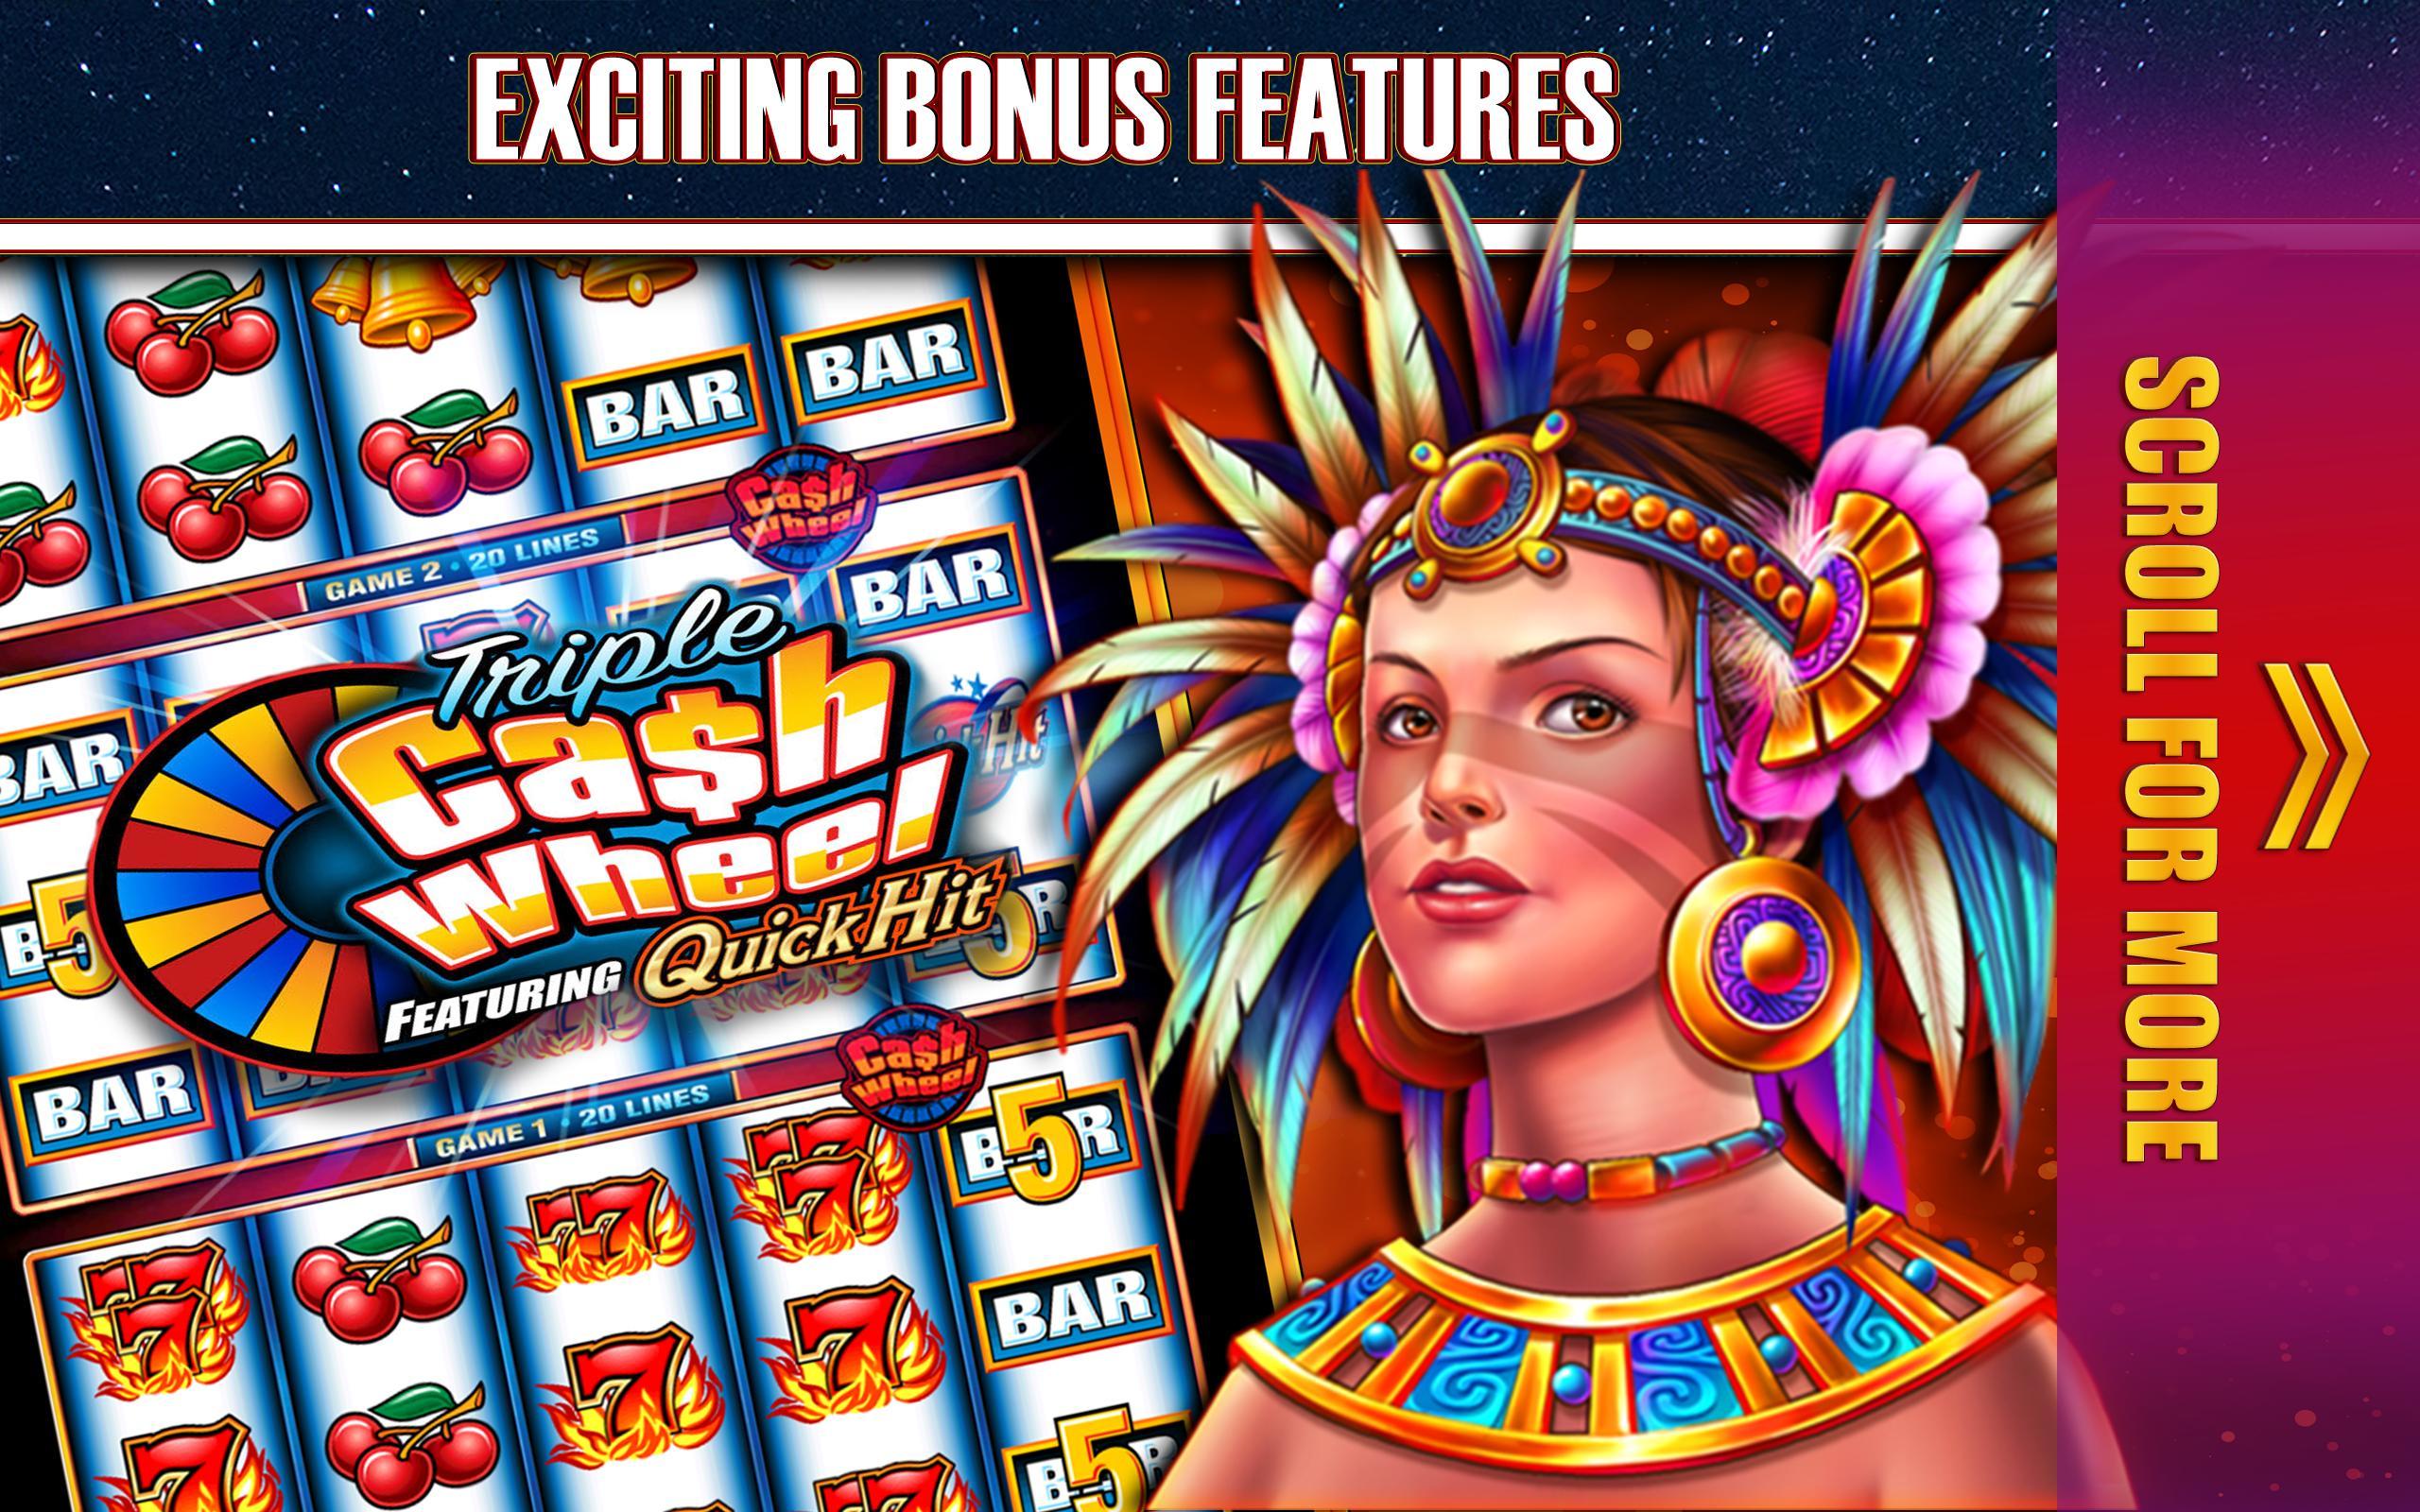 Roulette bonus offers